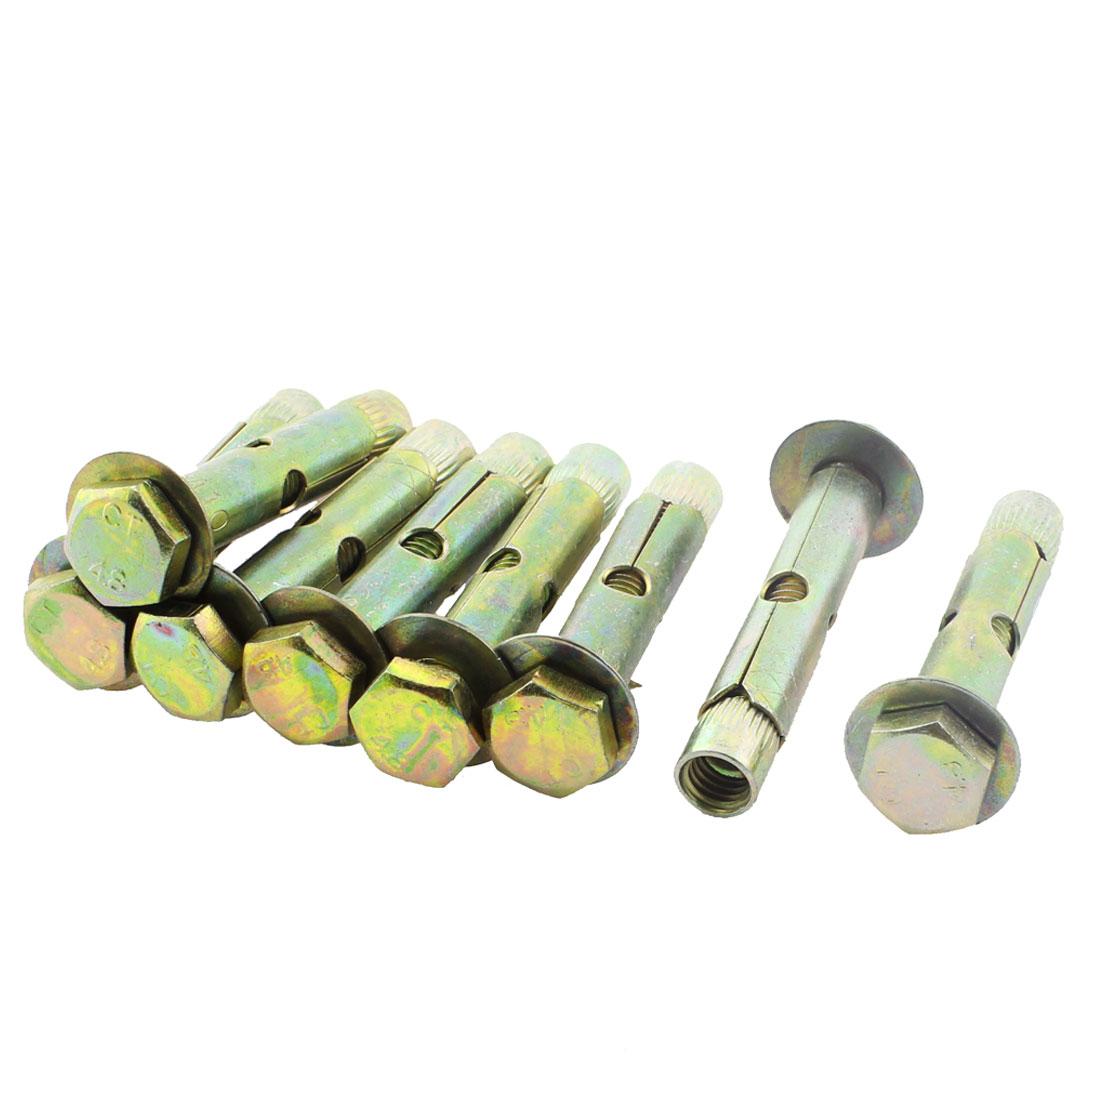 8Pcs M8 x 49mm Thread 54mm Long Hex Nut Split Sleeve Expansion Bolts Anchors Screws Fasteners